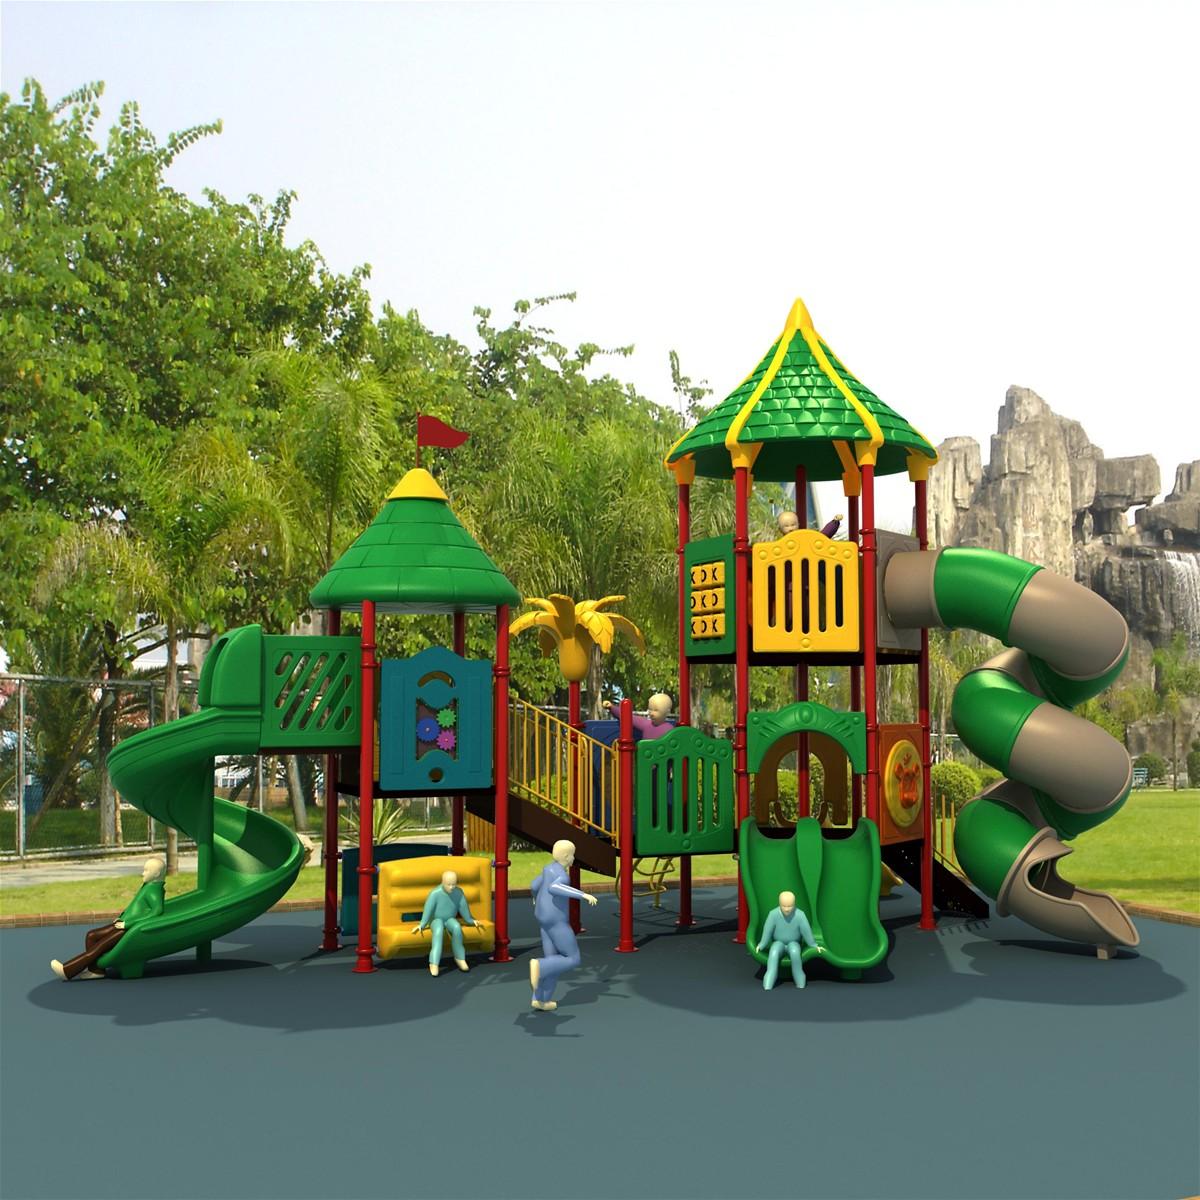 Big kids playground set (12042A)